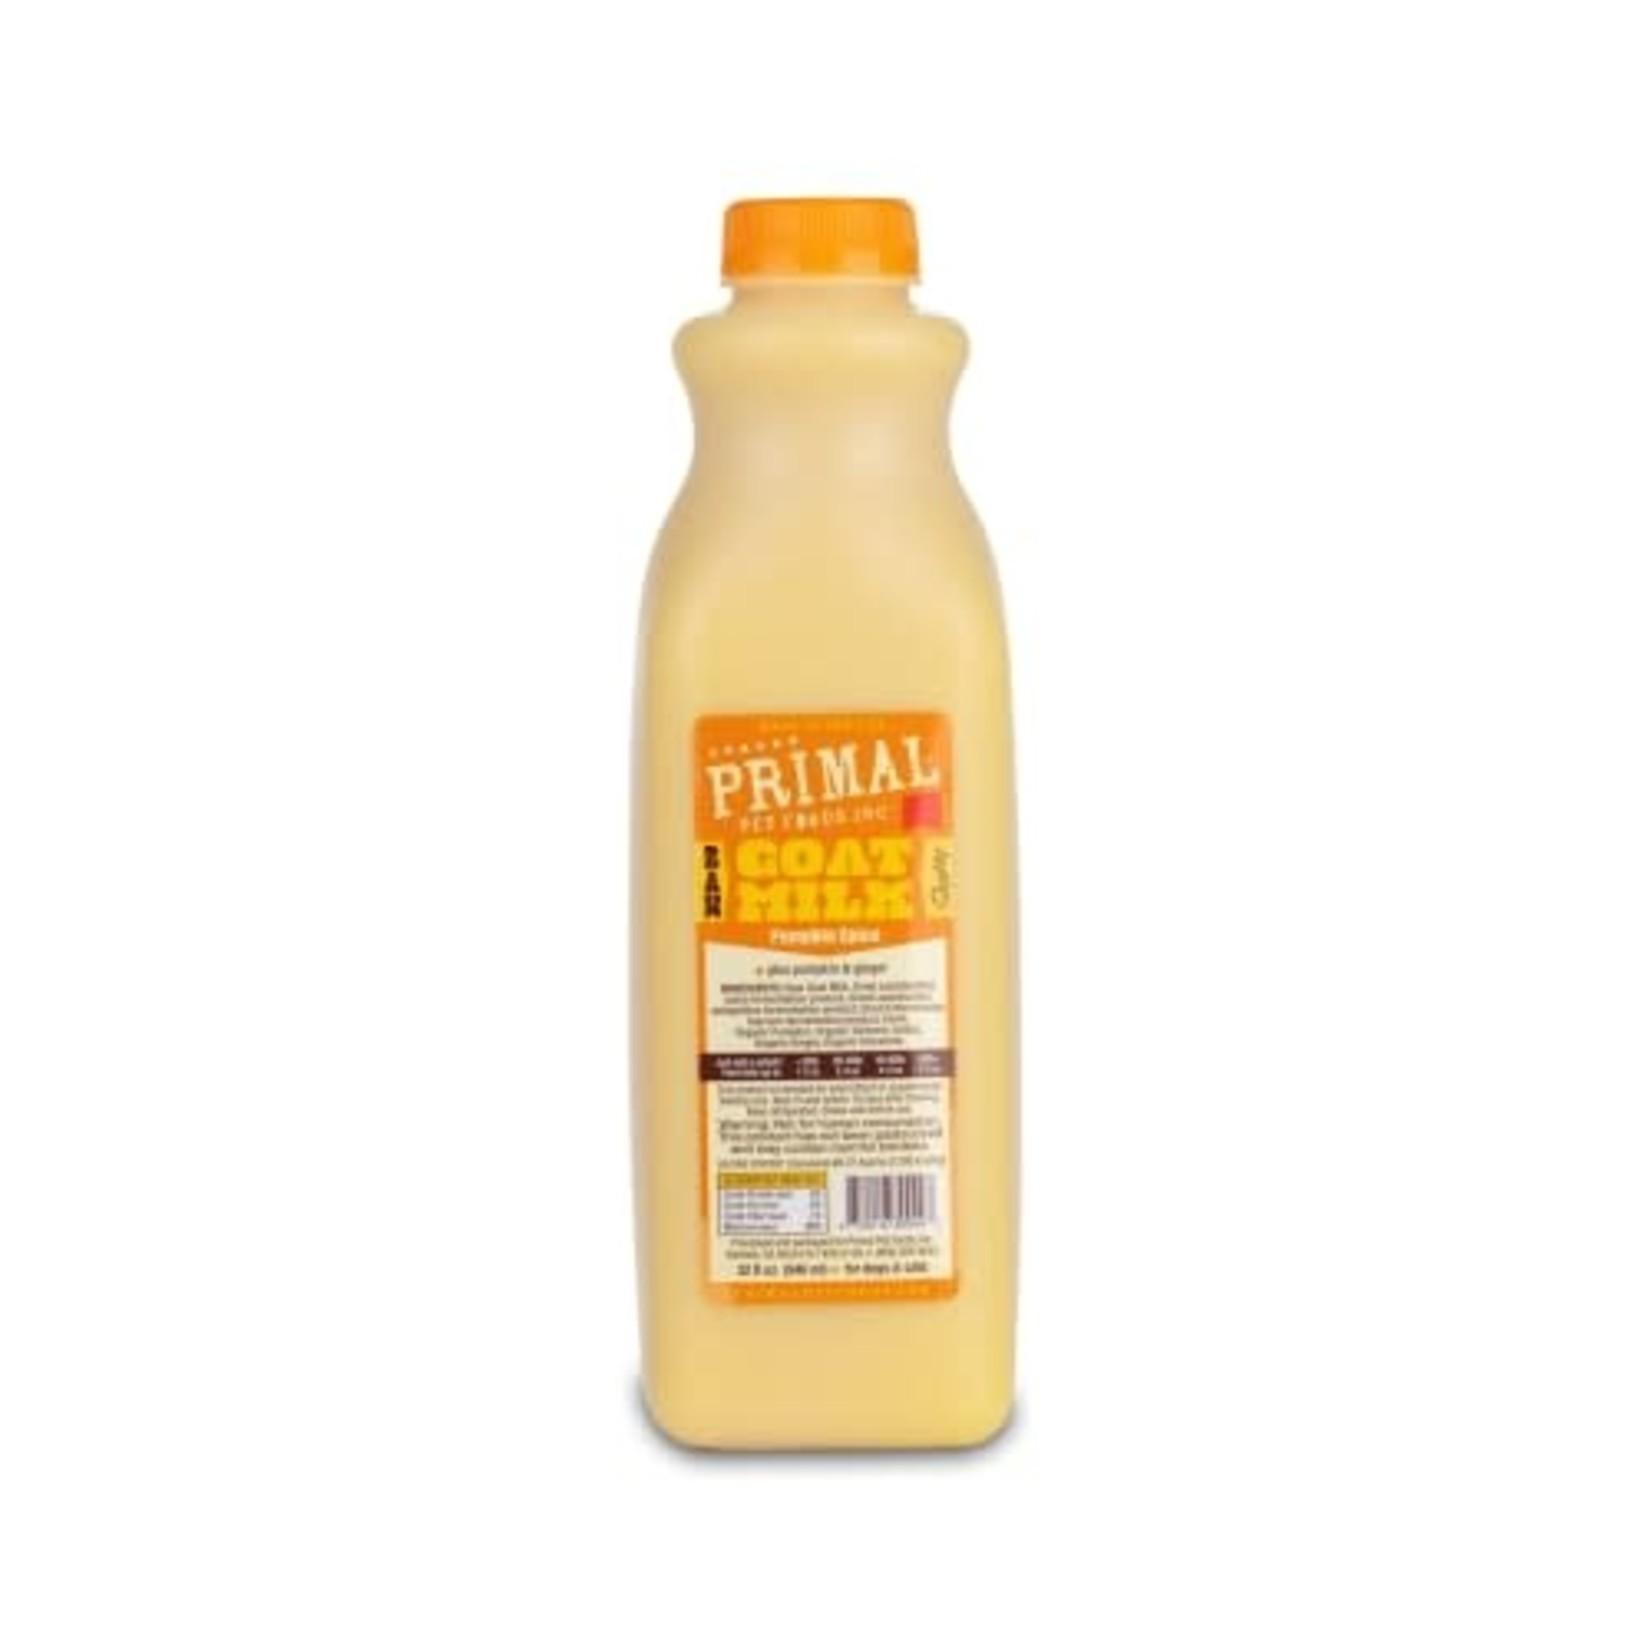 Primal Pet Foods Primal Frozen Raw Goat Milk Pumpkin Spice 32 OZ